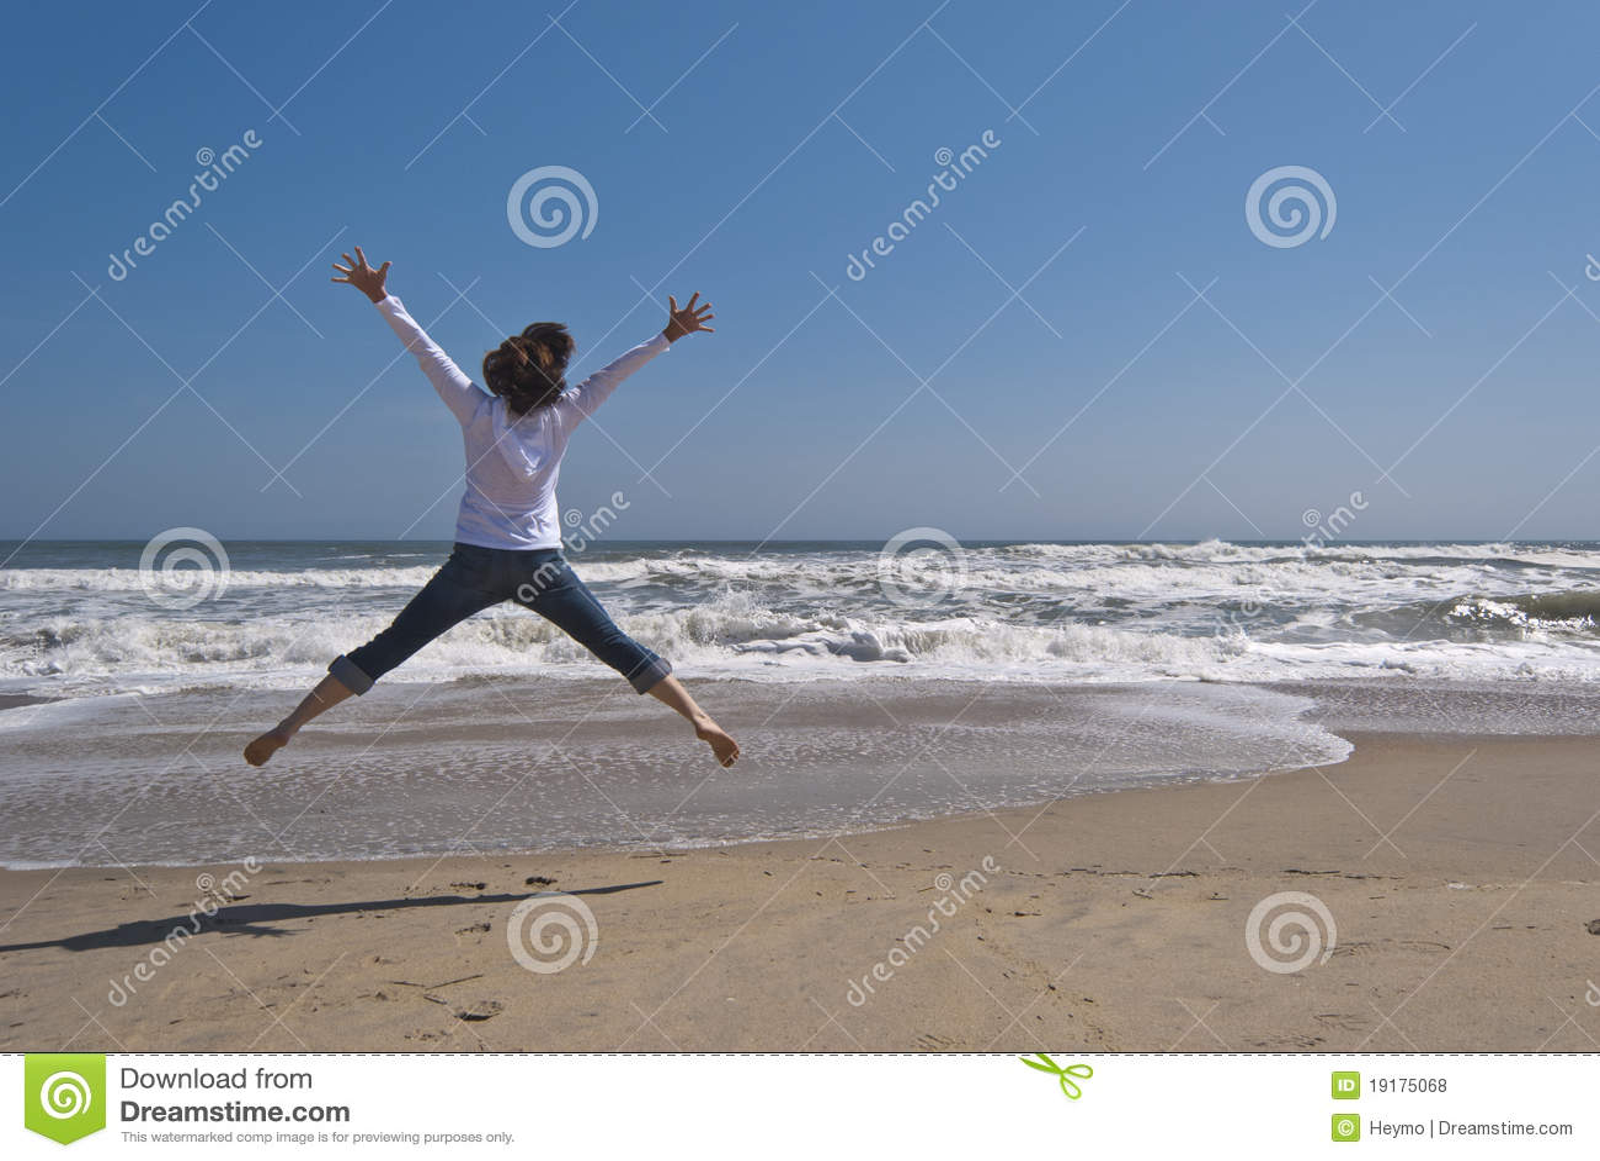 jumping for joy royalty free stock photos image 19175068